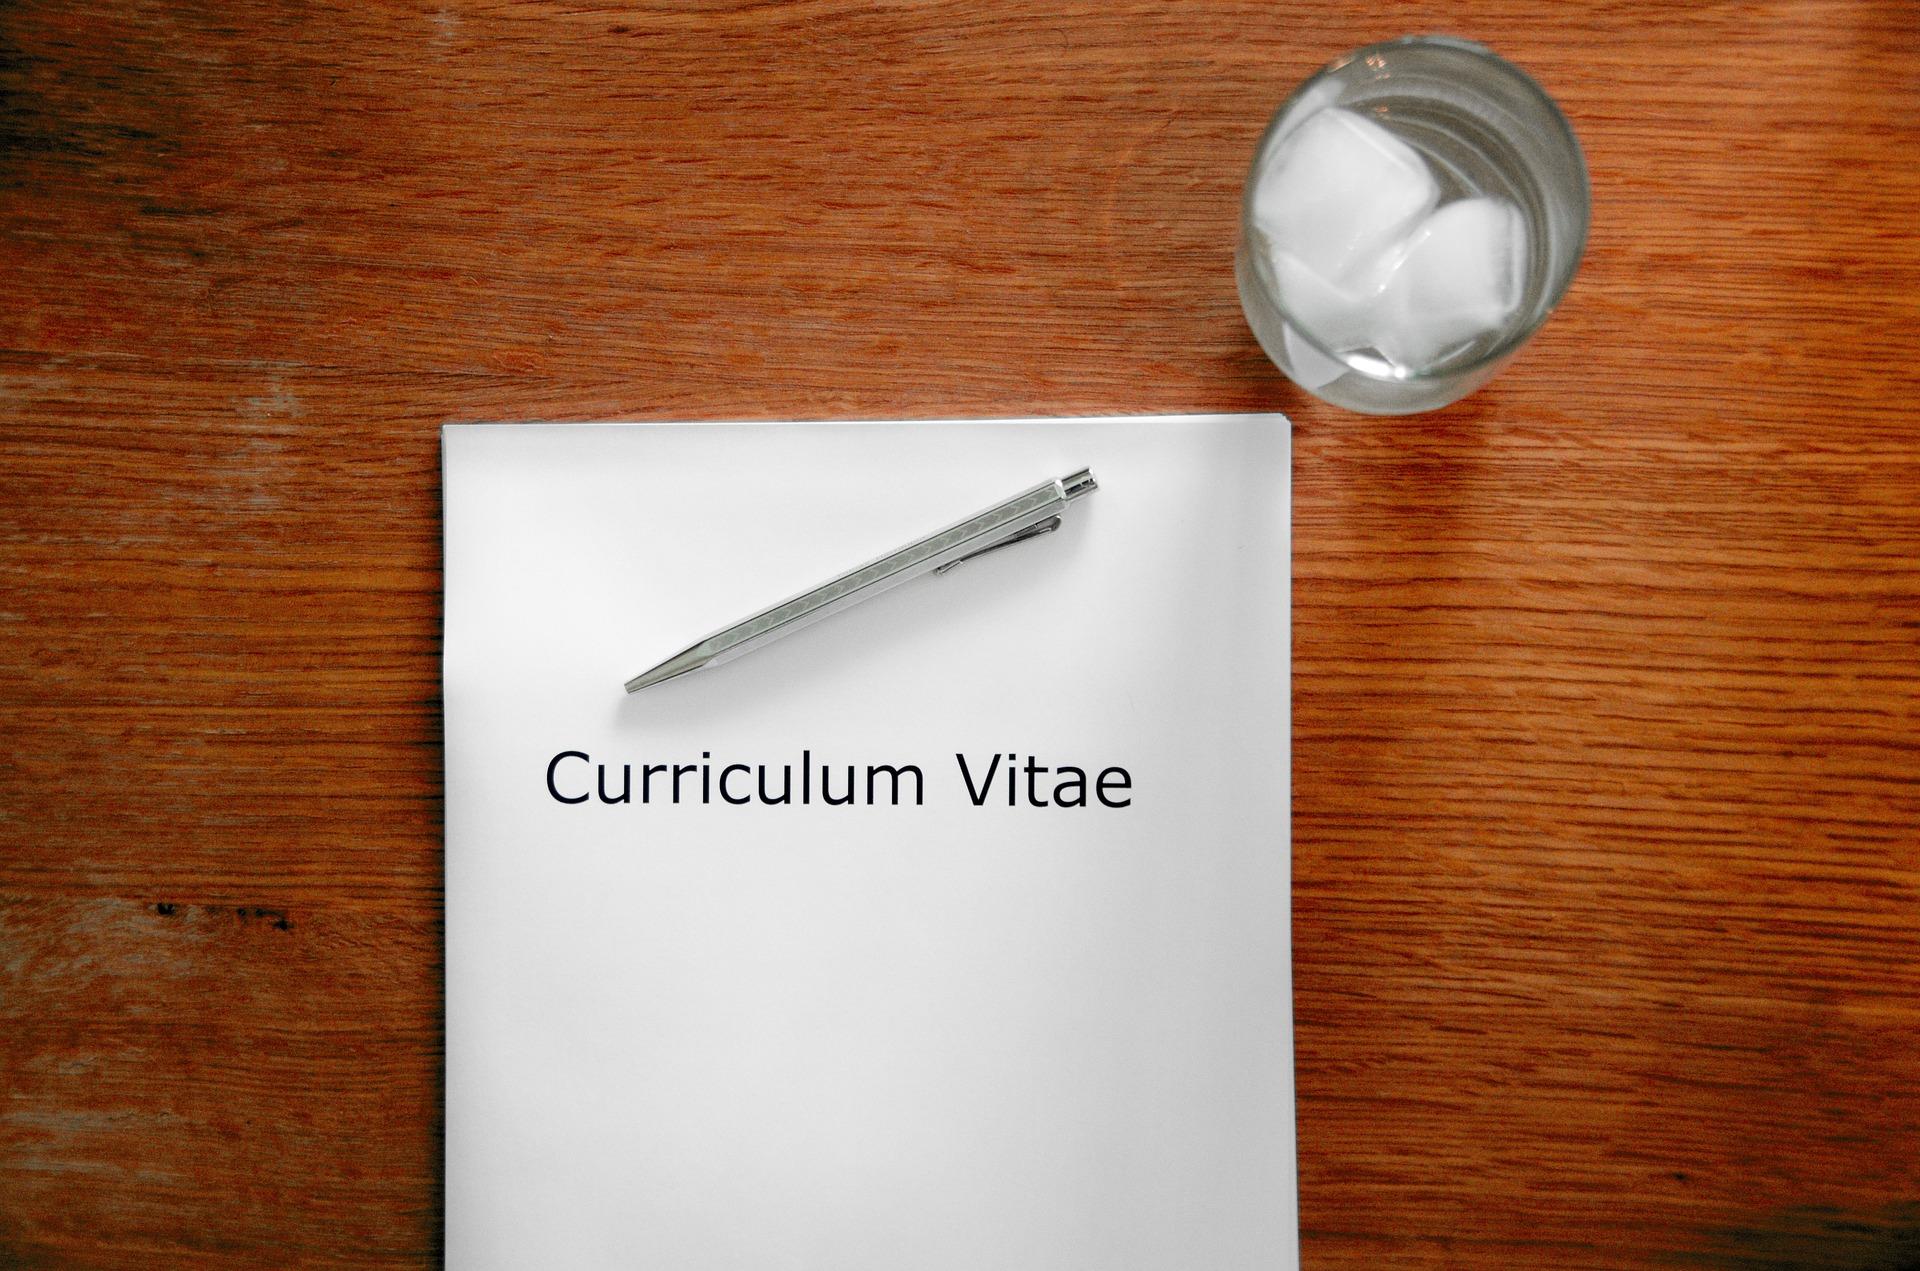 curriculum vitae jelentése